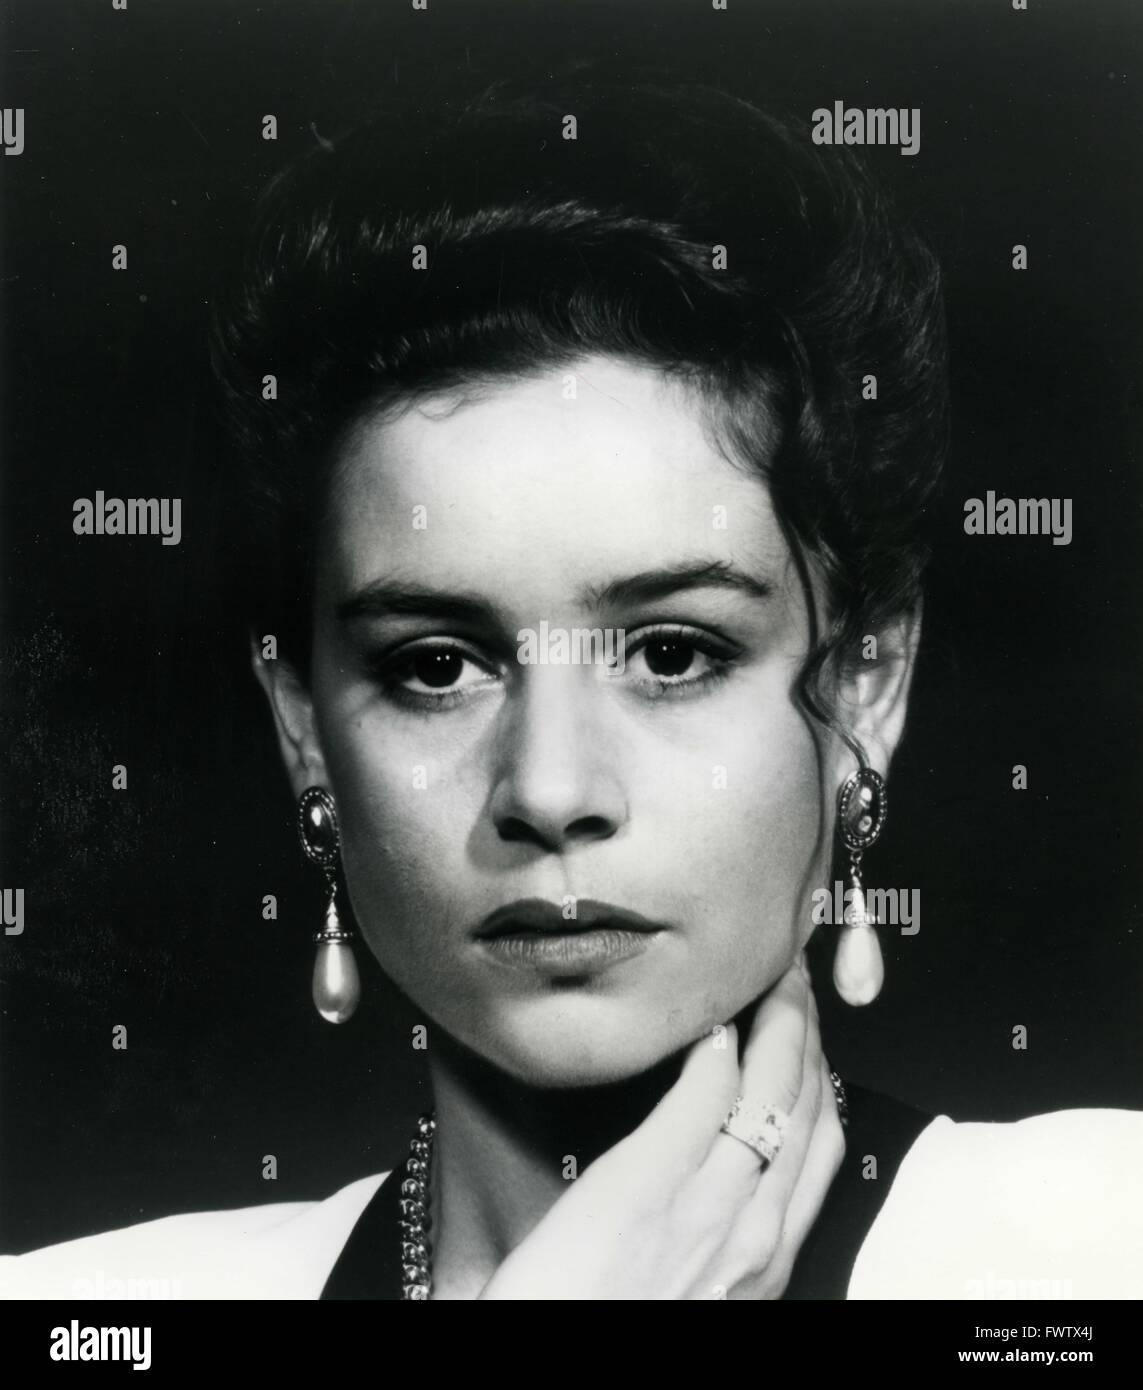 embeth davidtz filmographie - photo #5